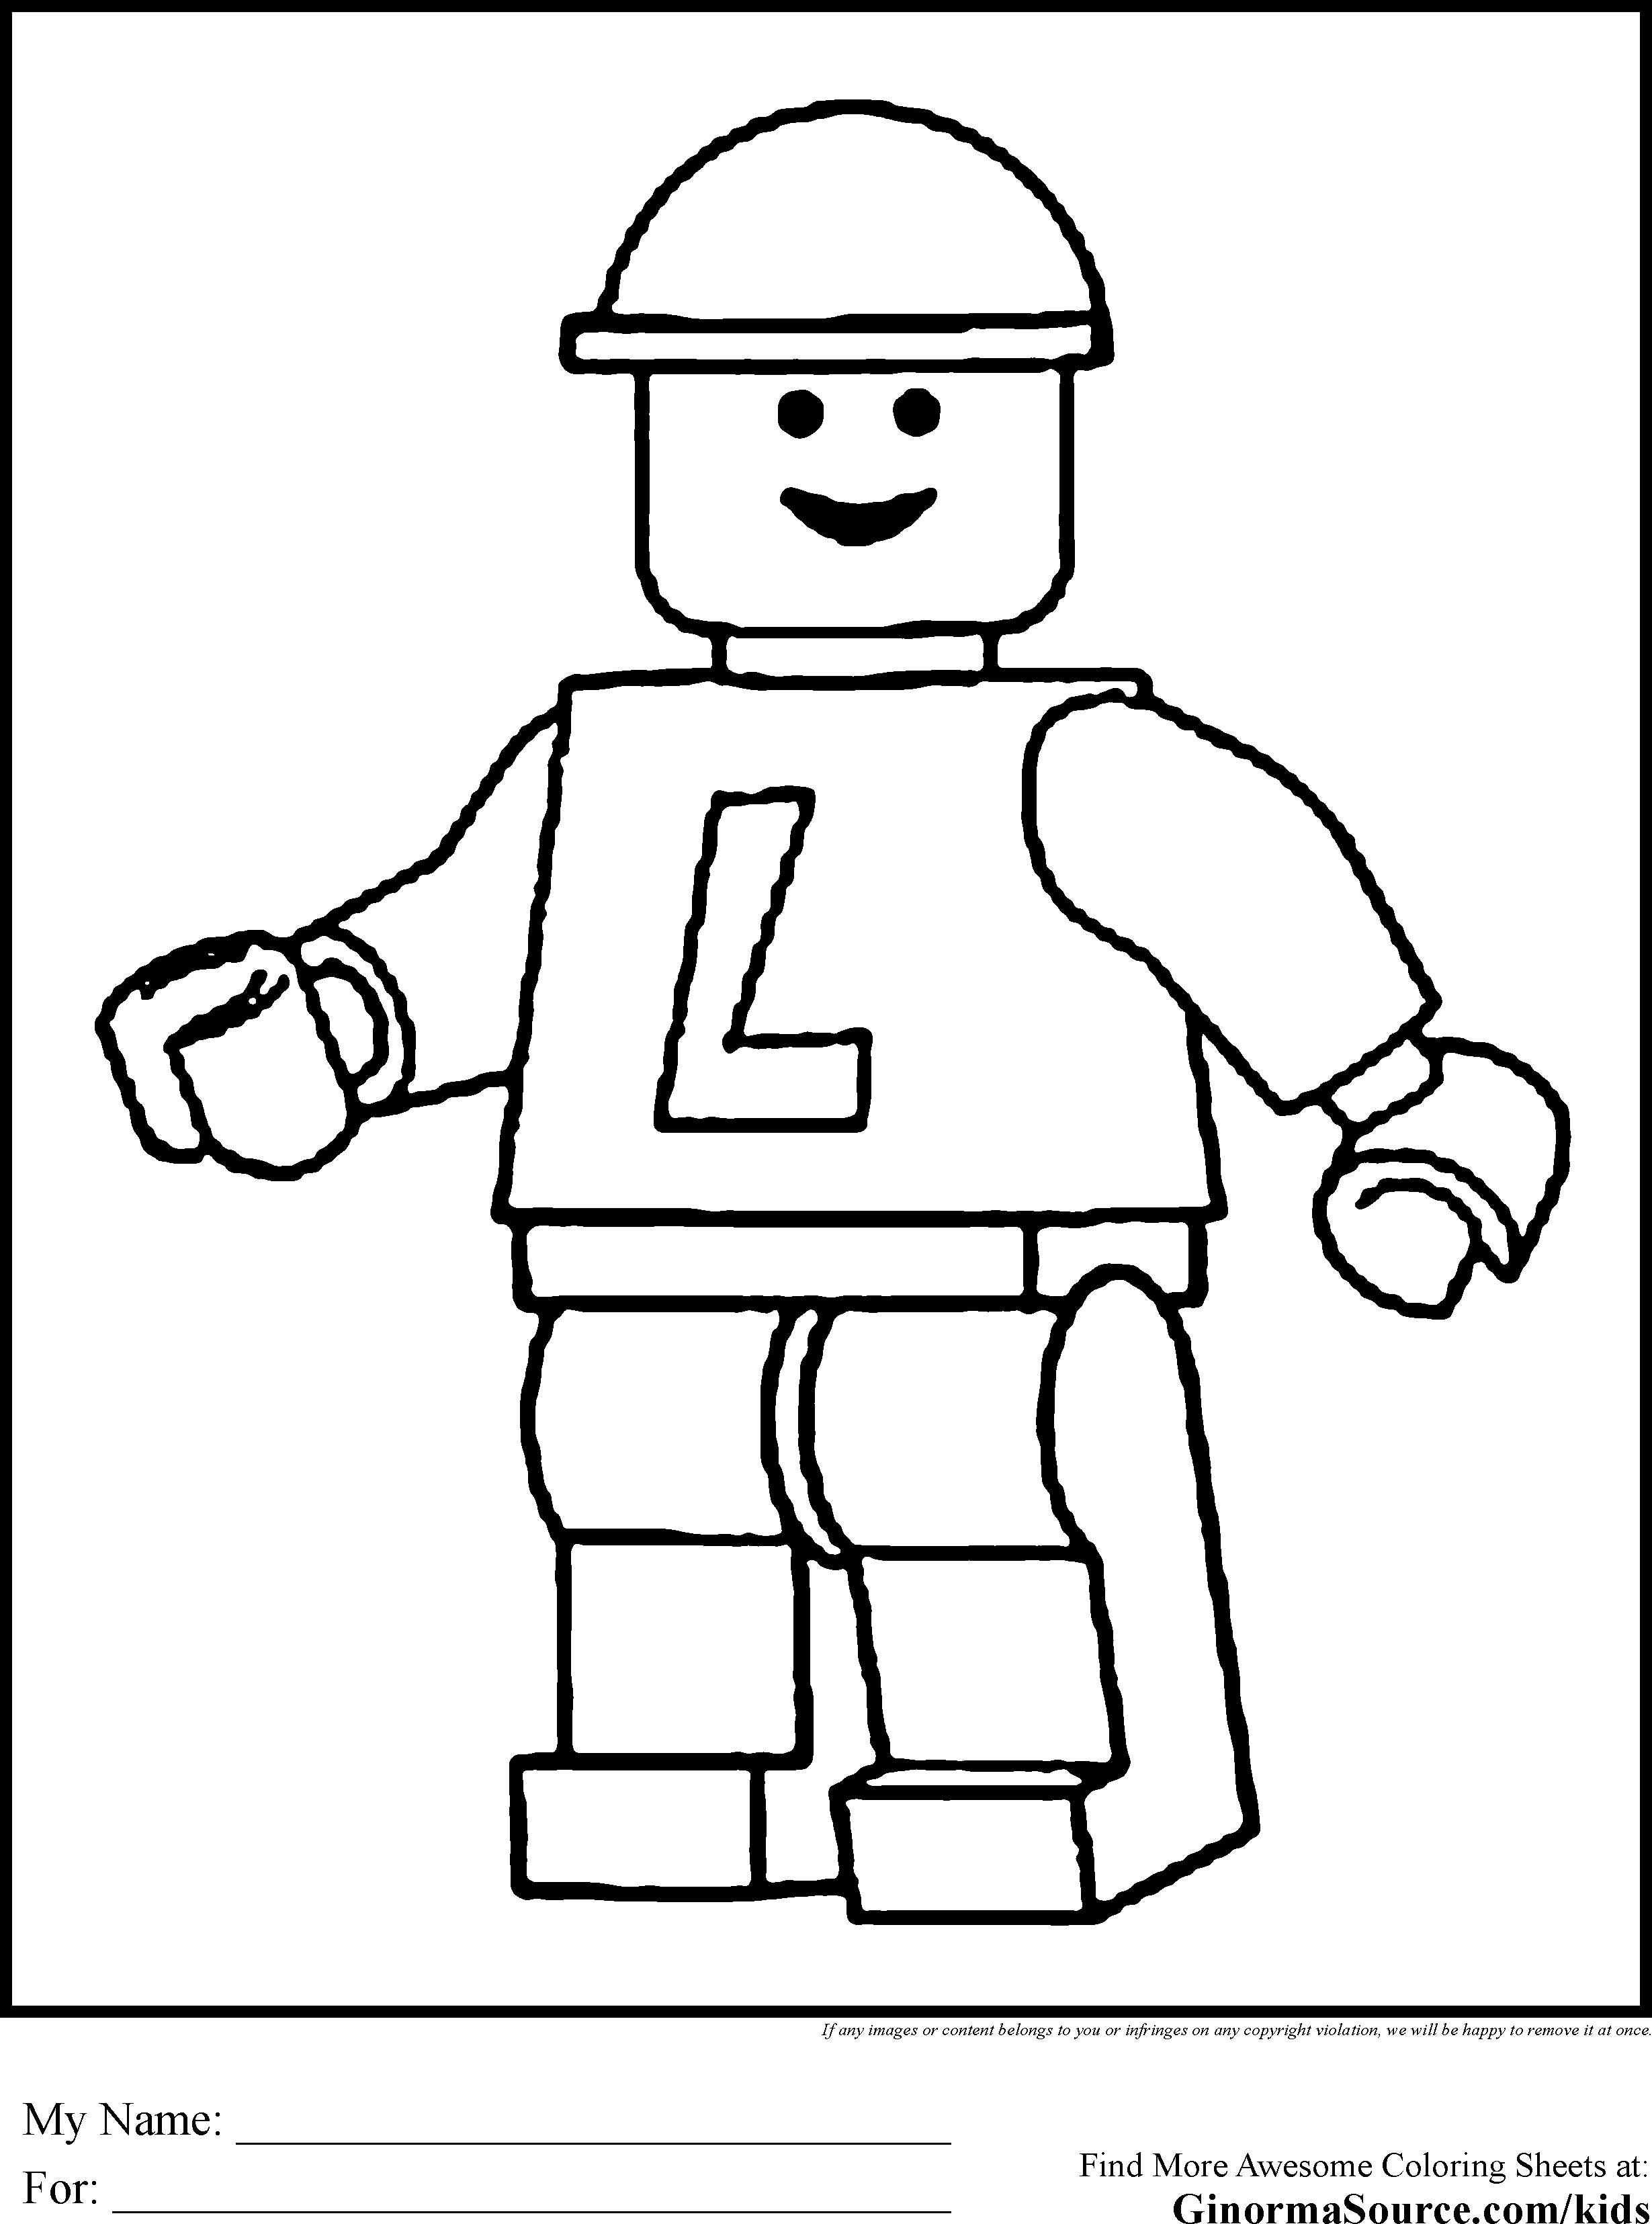 Lego Coloring Pages Legoman Gif 2 459 3 310 Pixels Lego Coloring Lego Coloring Pages Lego Coloring Sheet